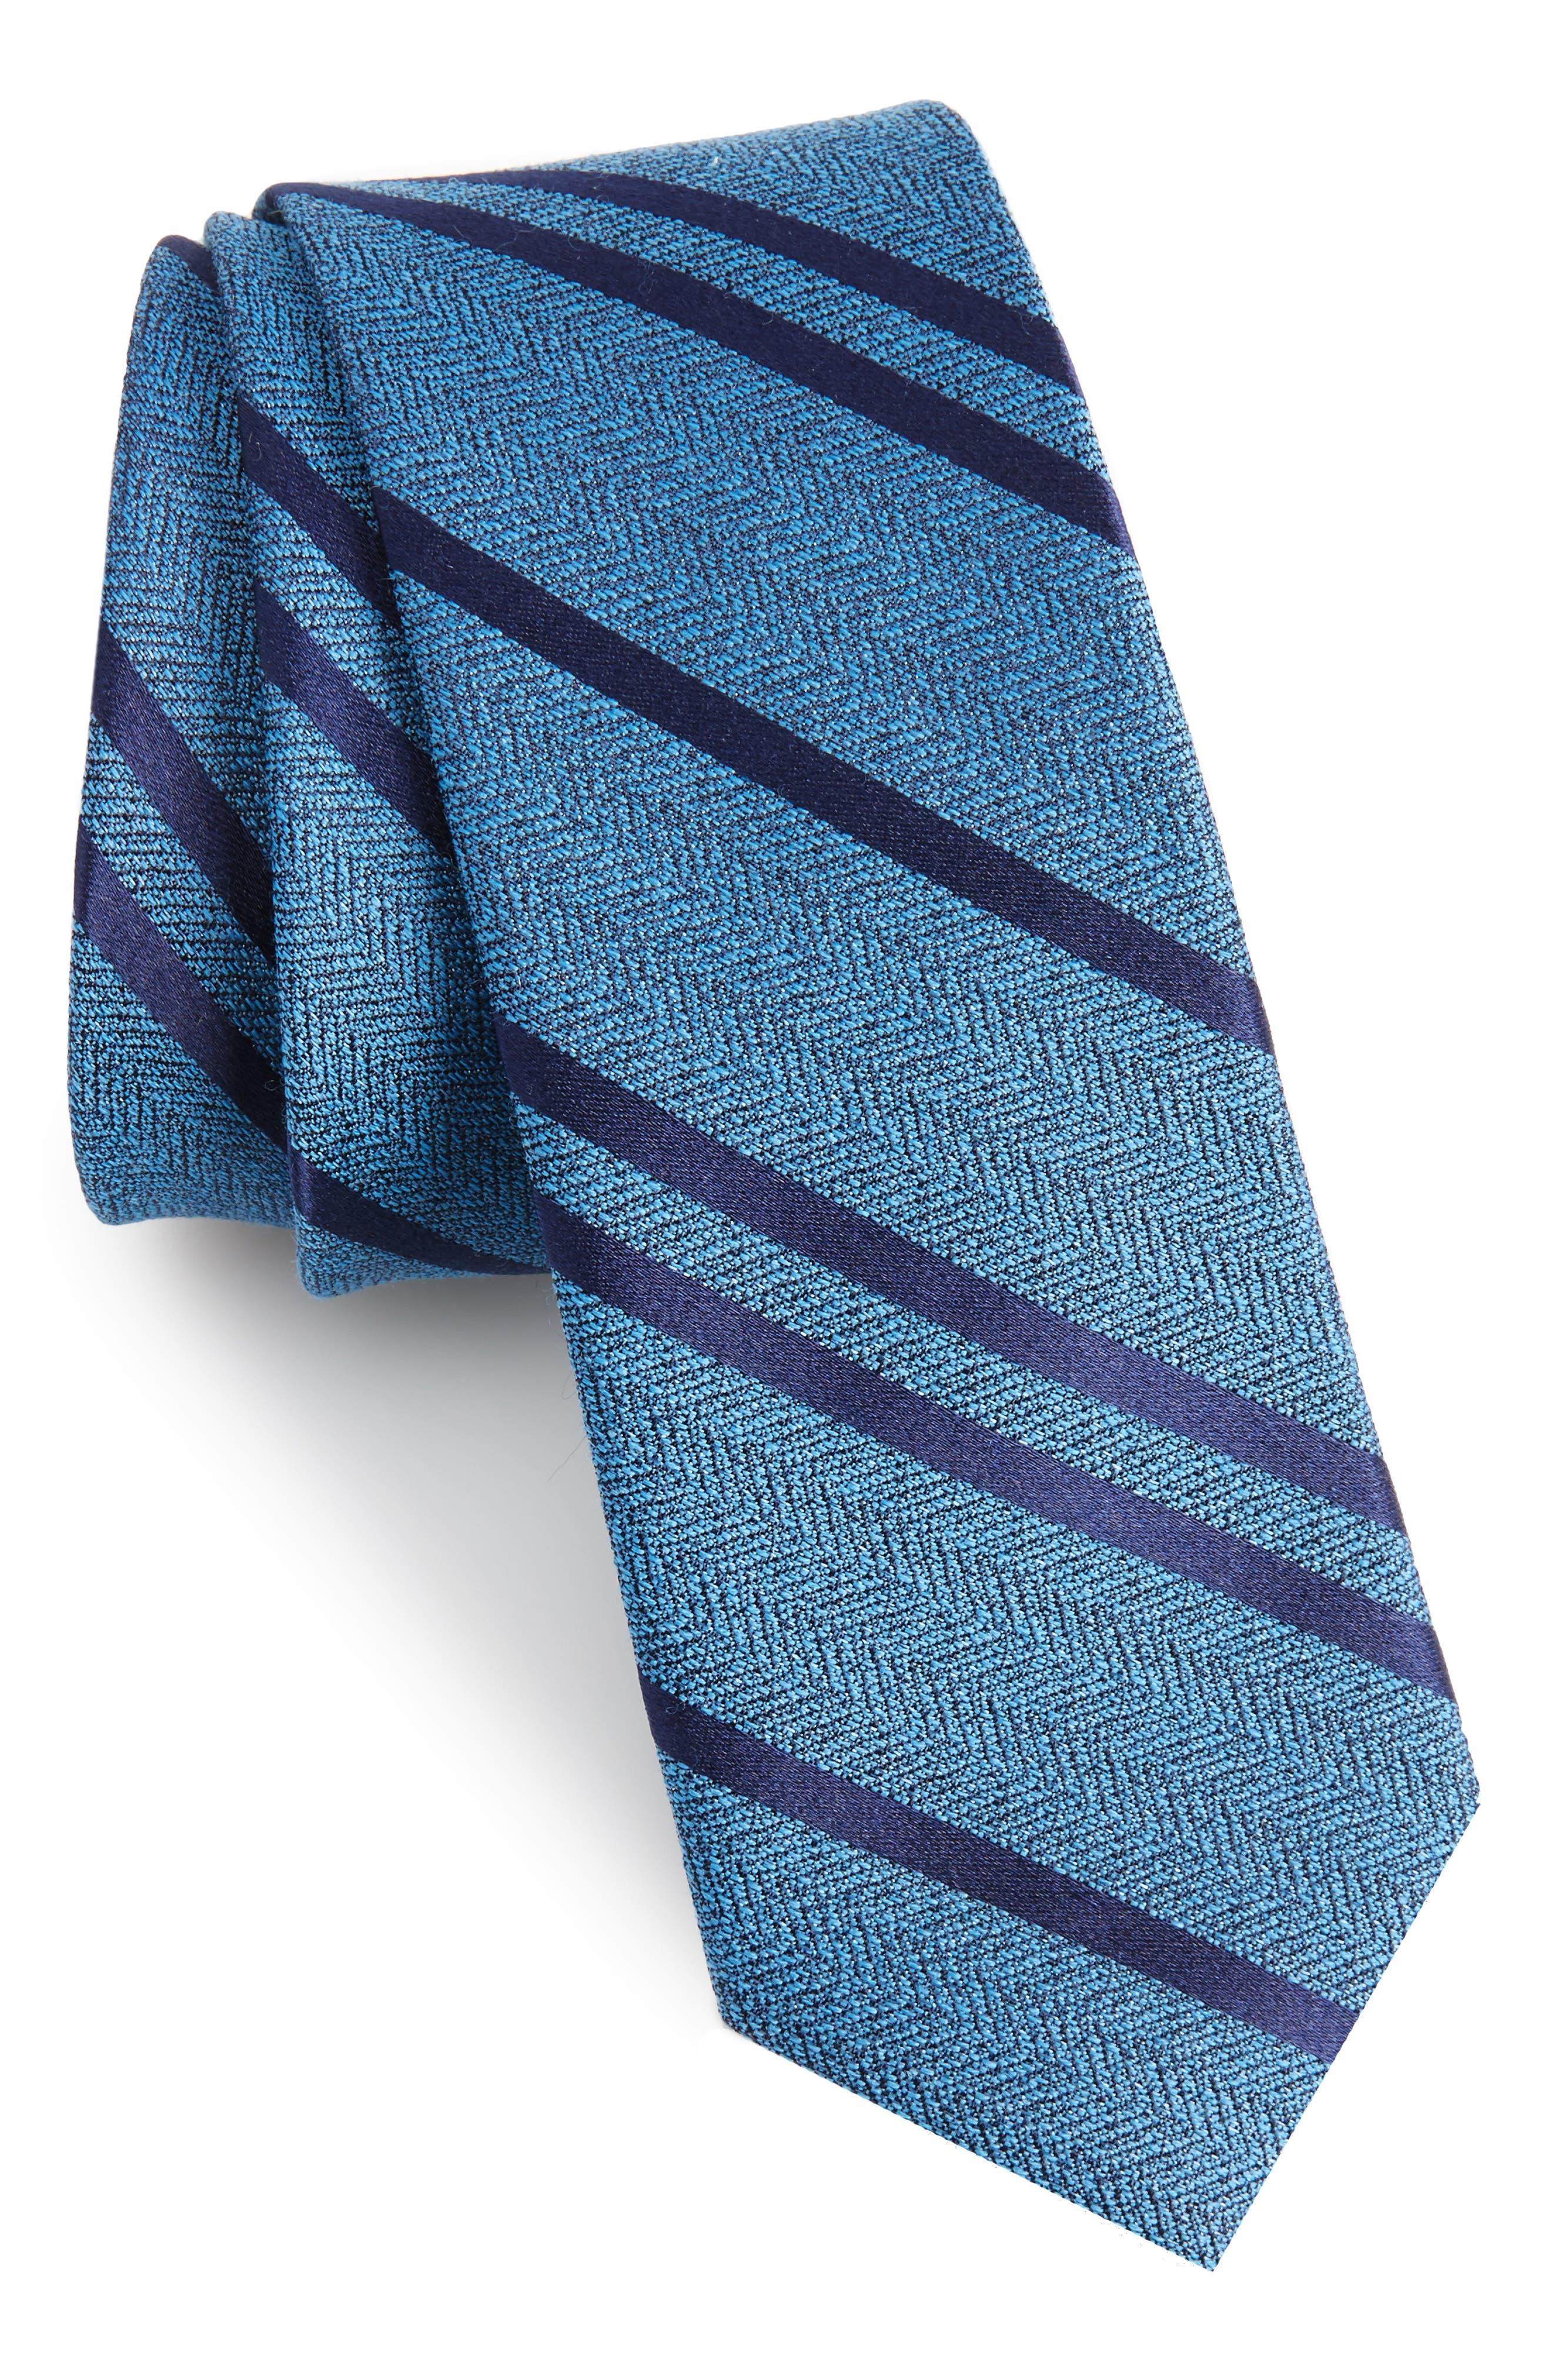 Path Stripe Wool & Silk Tie,                         Main,                         color, Serene Blue